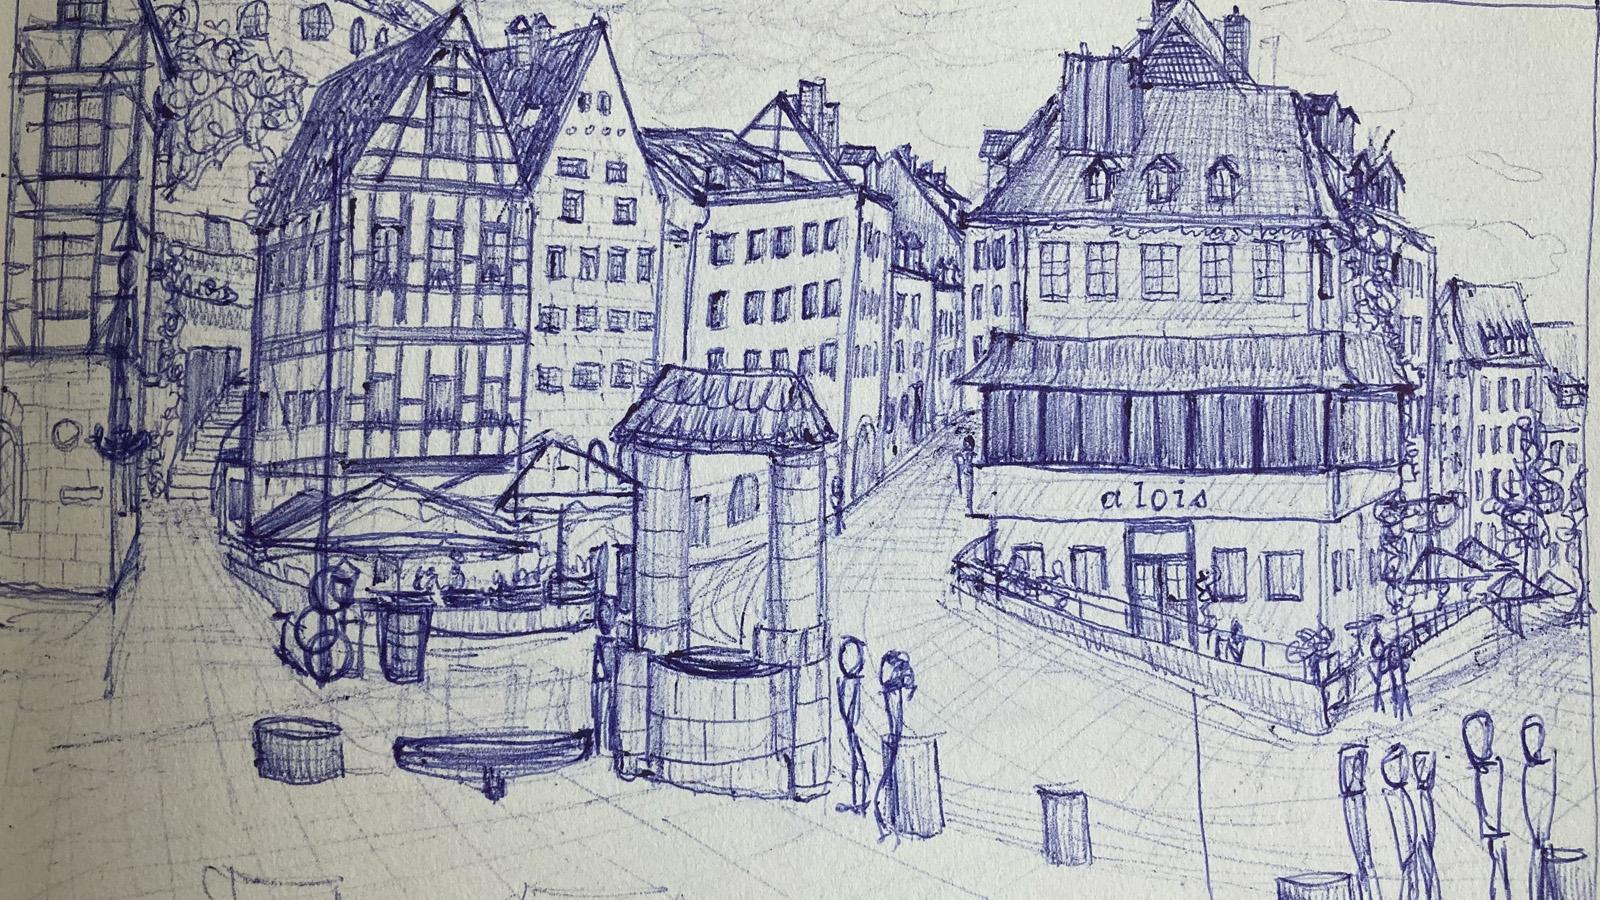 Tiergaertnertorplatz, Nuremberg